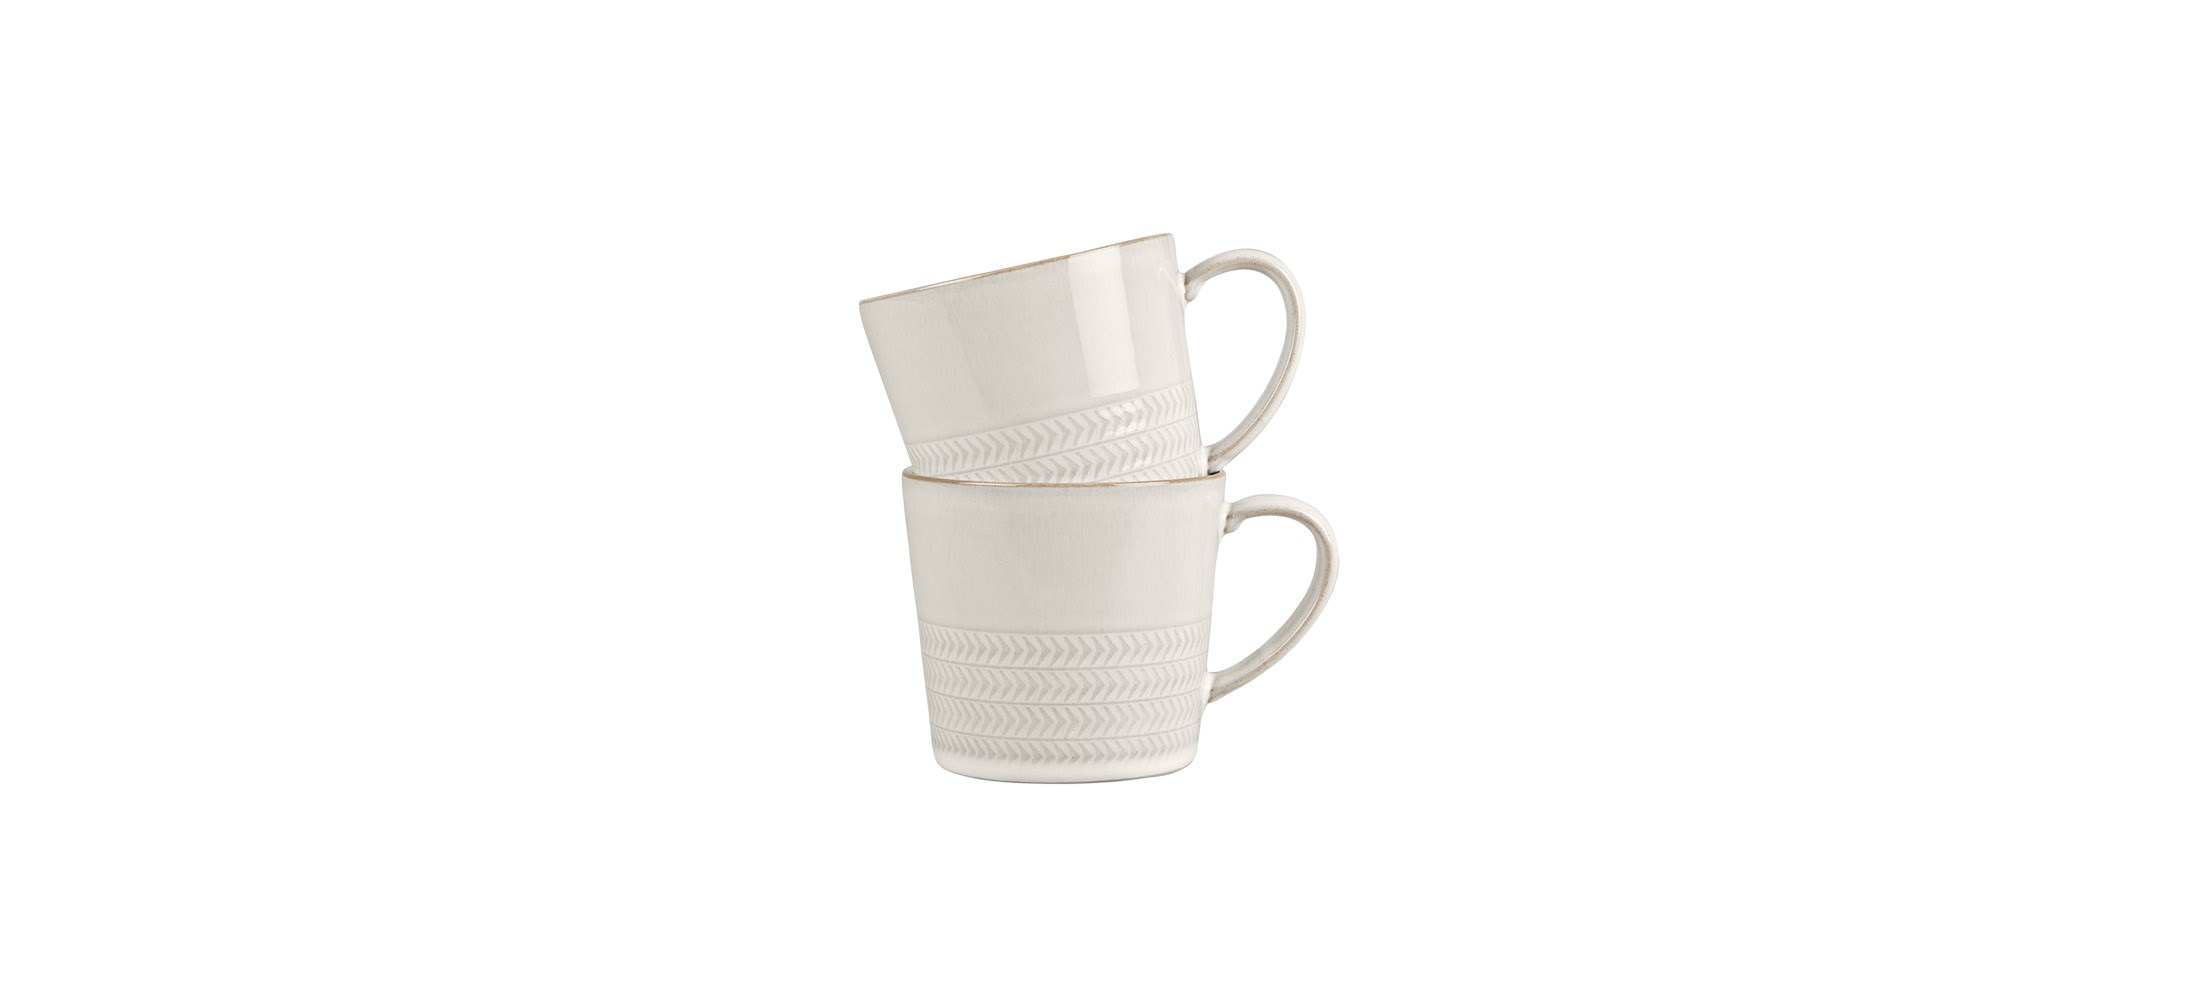 Denby natural canvas textured large mug